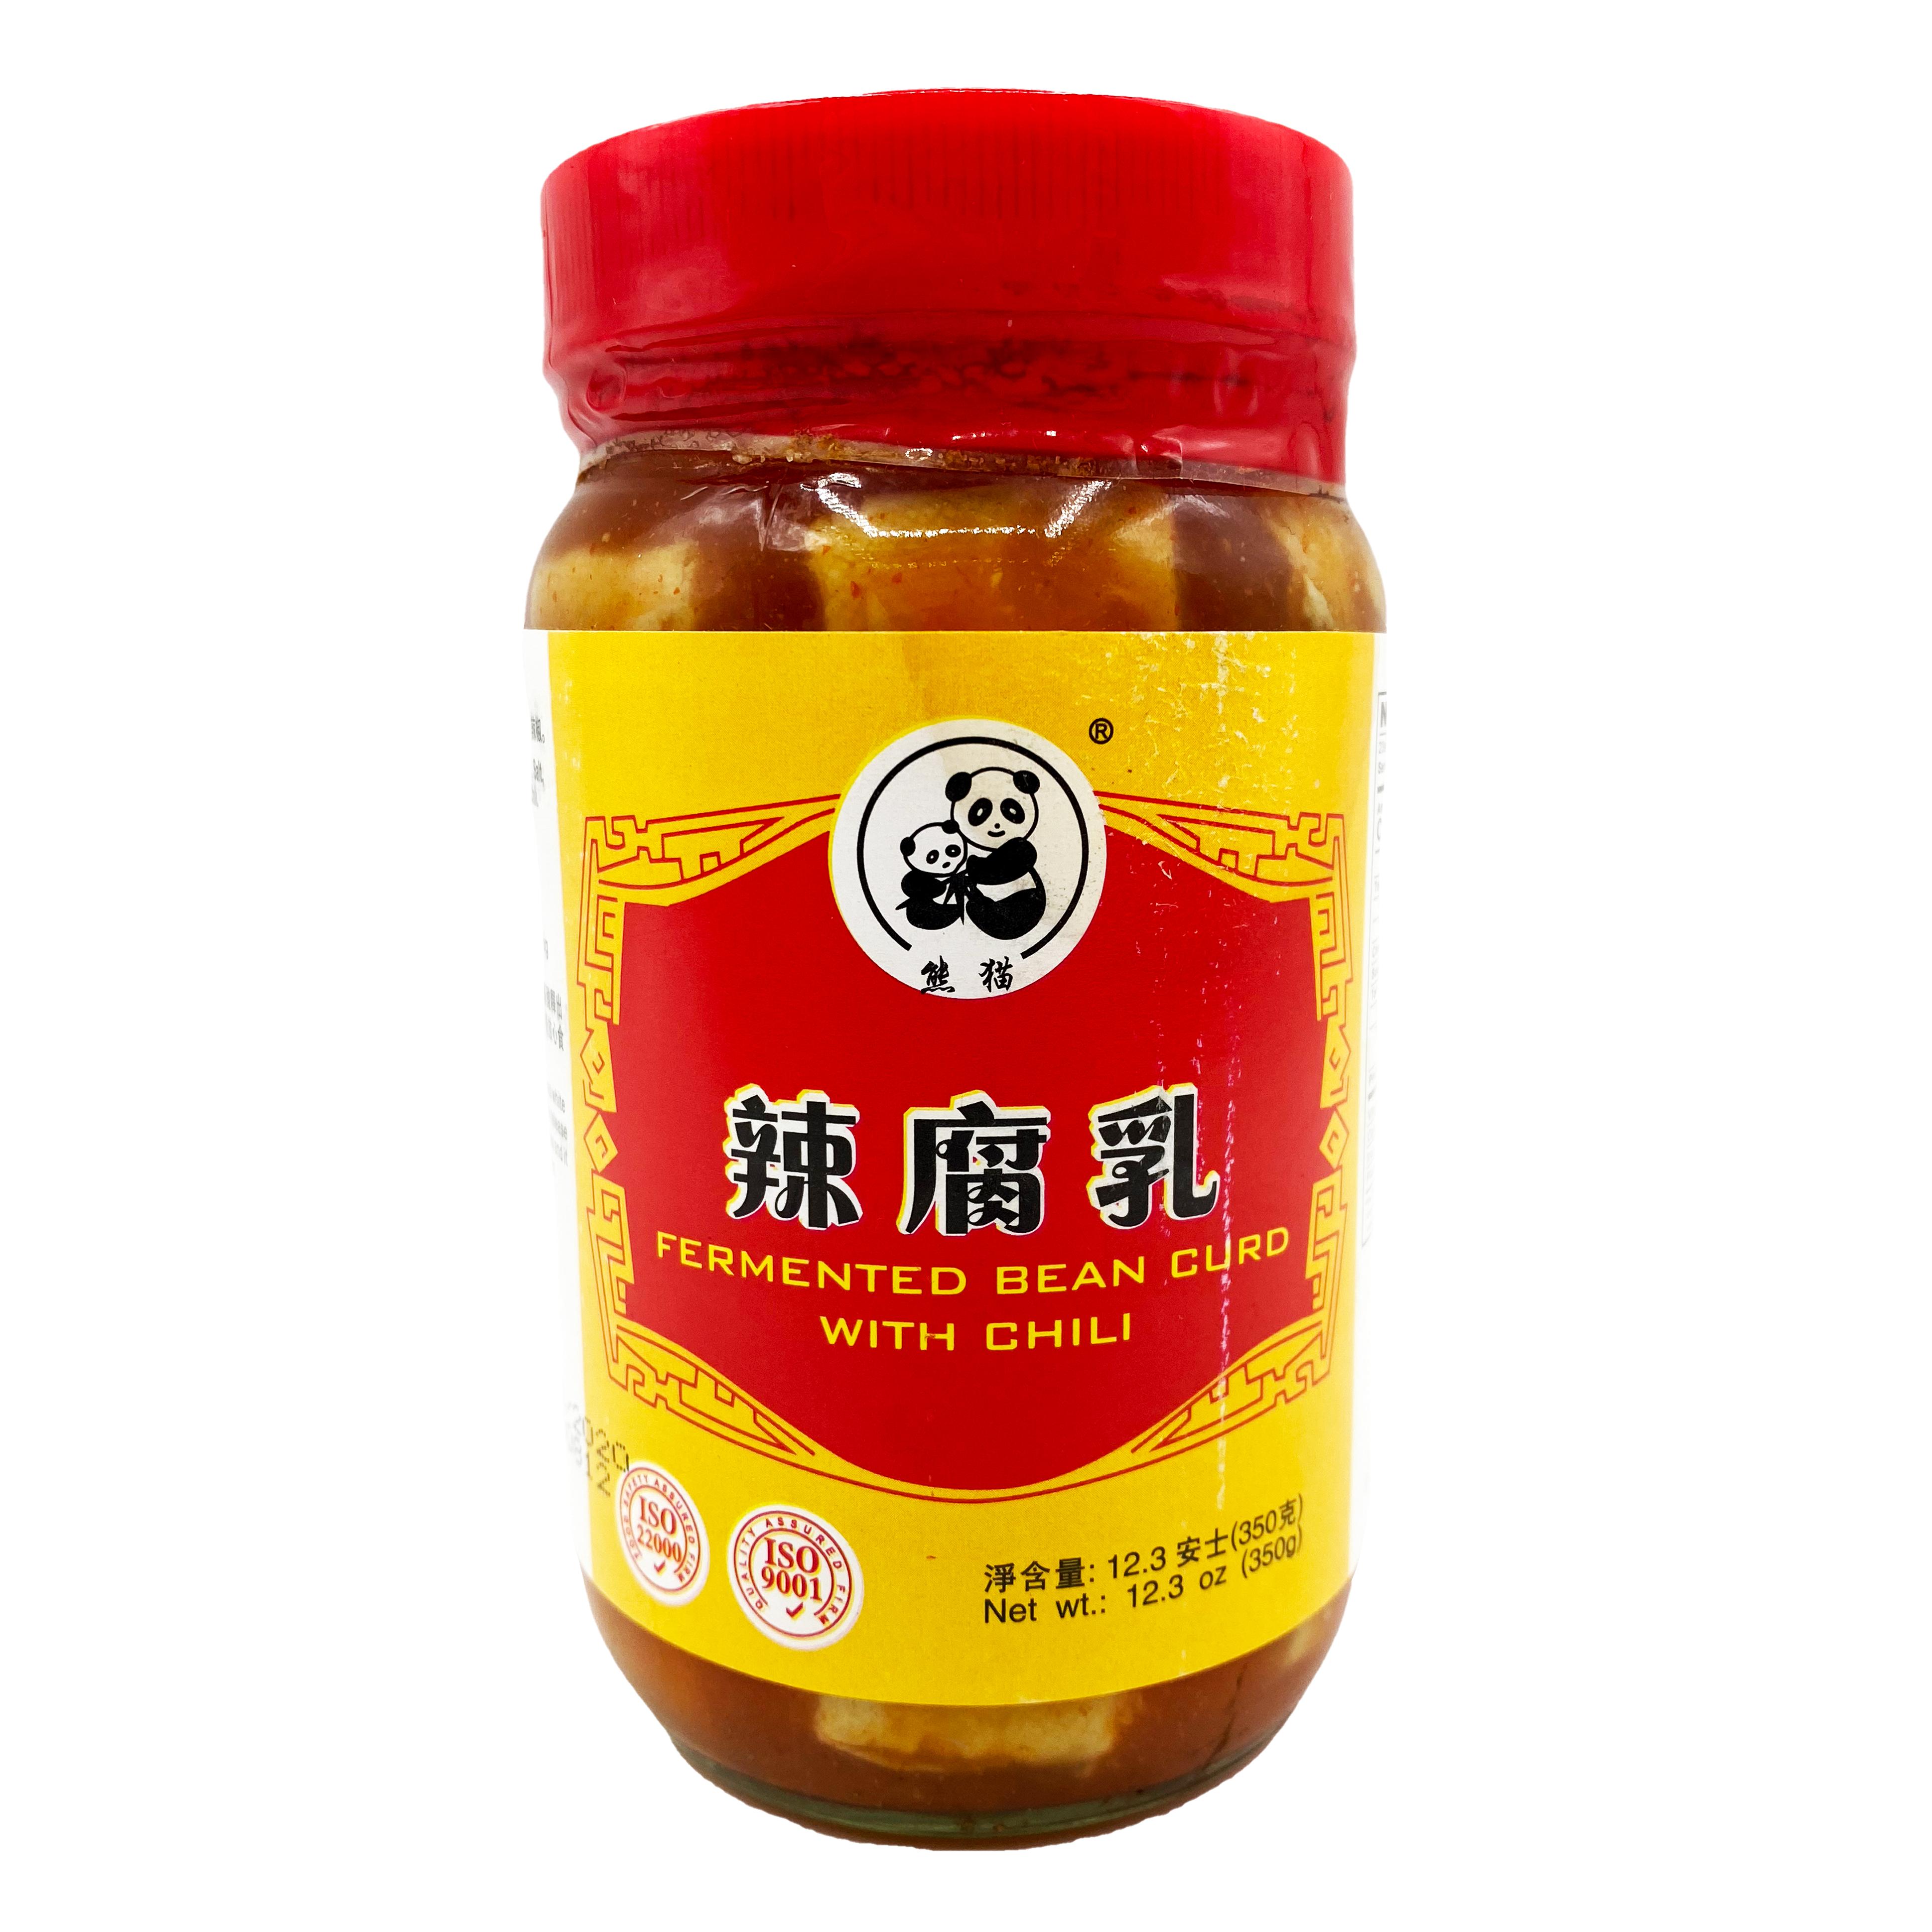 PANDA Fermented Bean Curd With Chilli 12.3 OZ